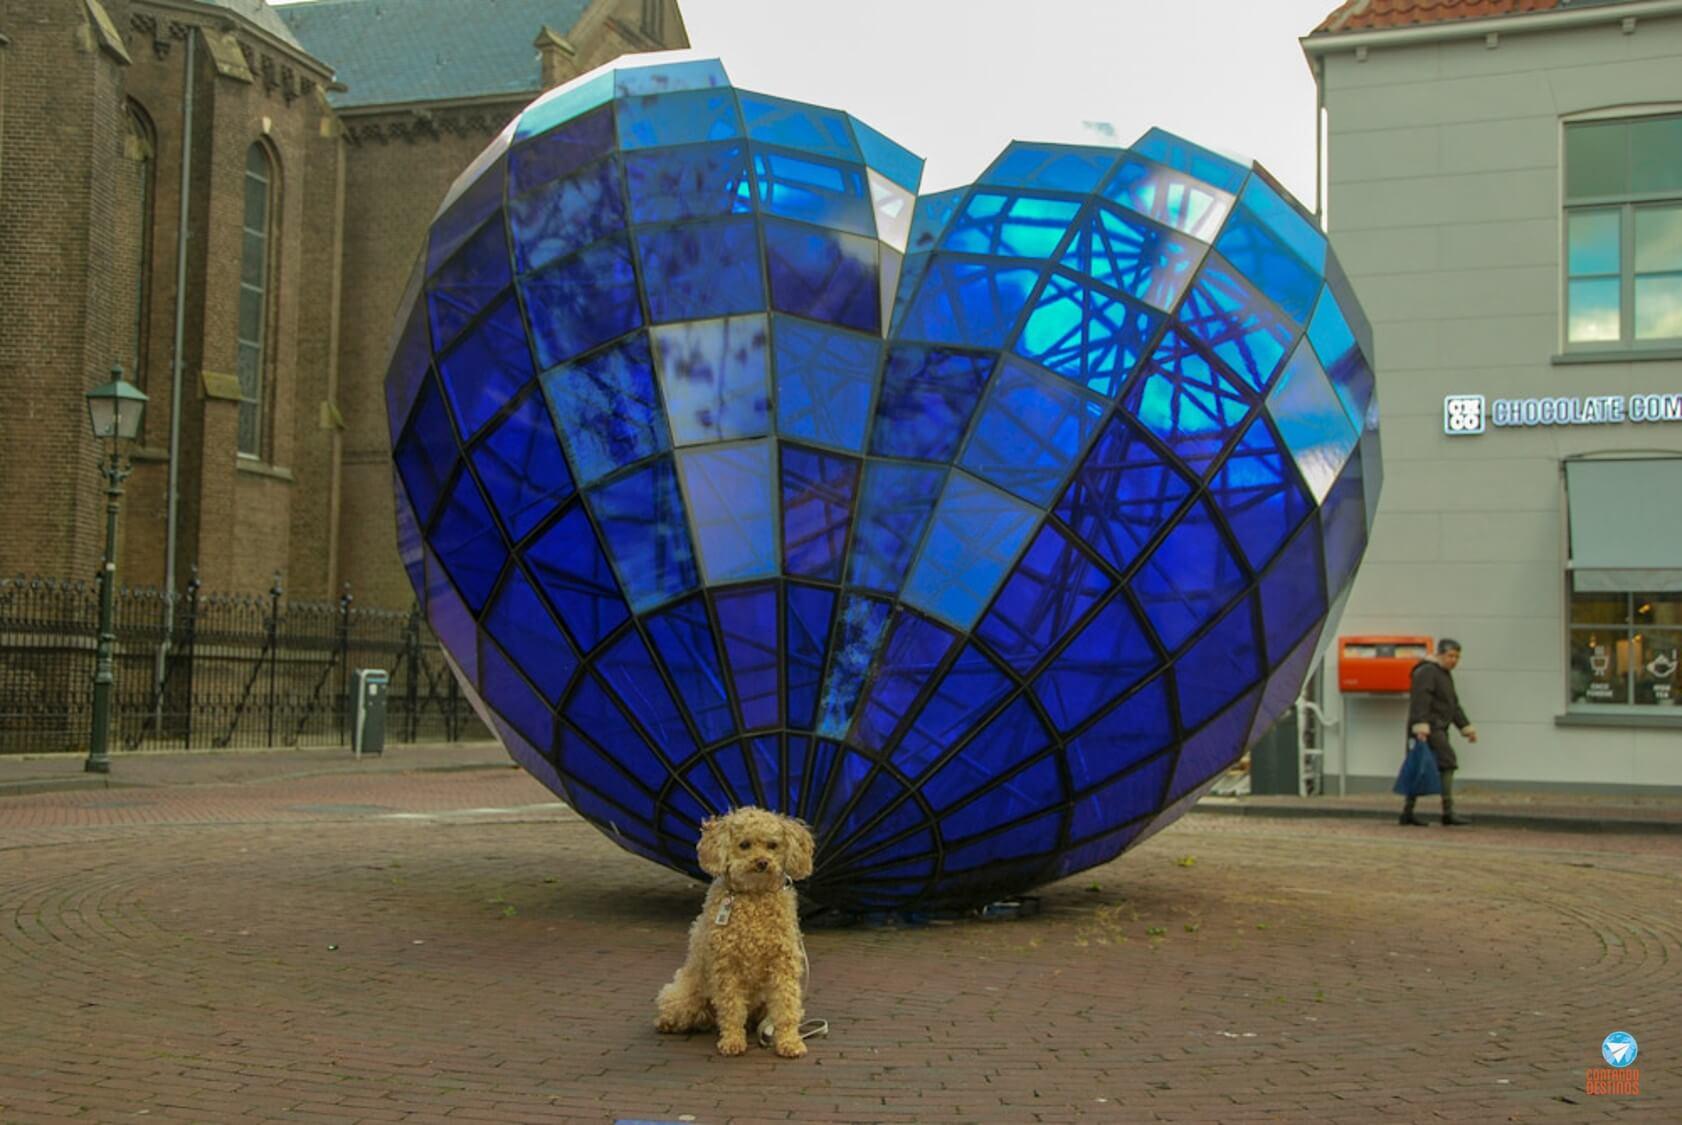 Delft Holanda